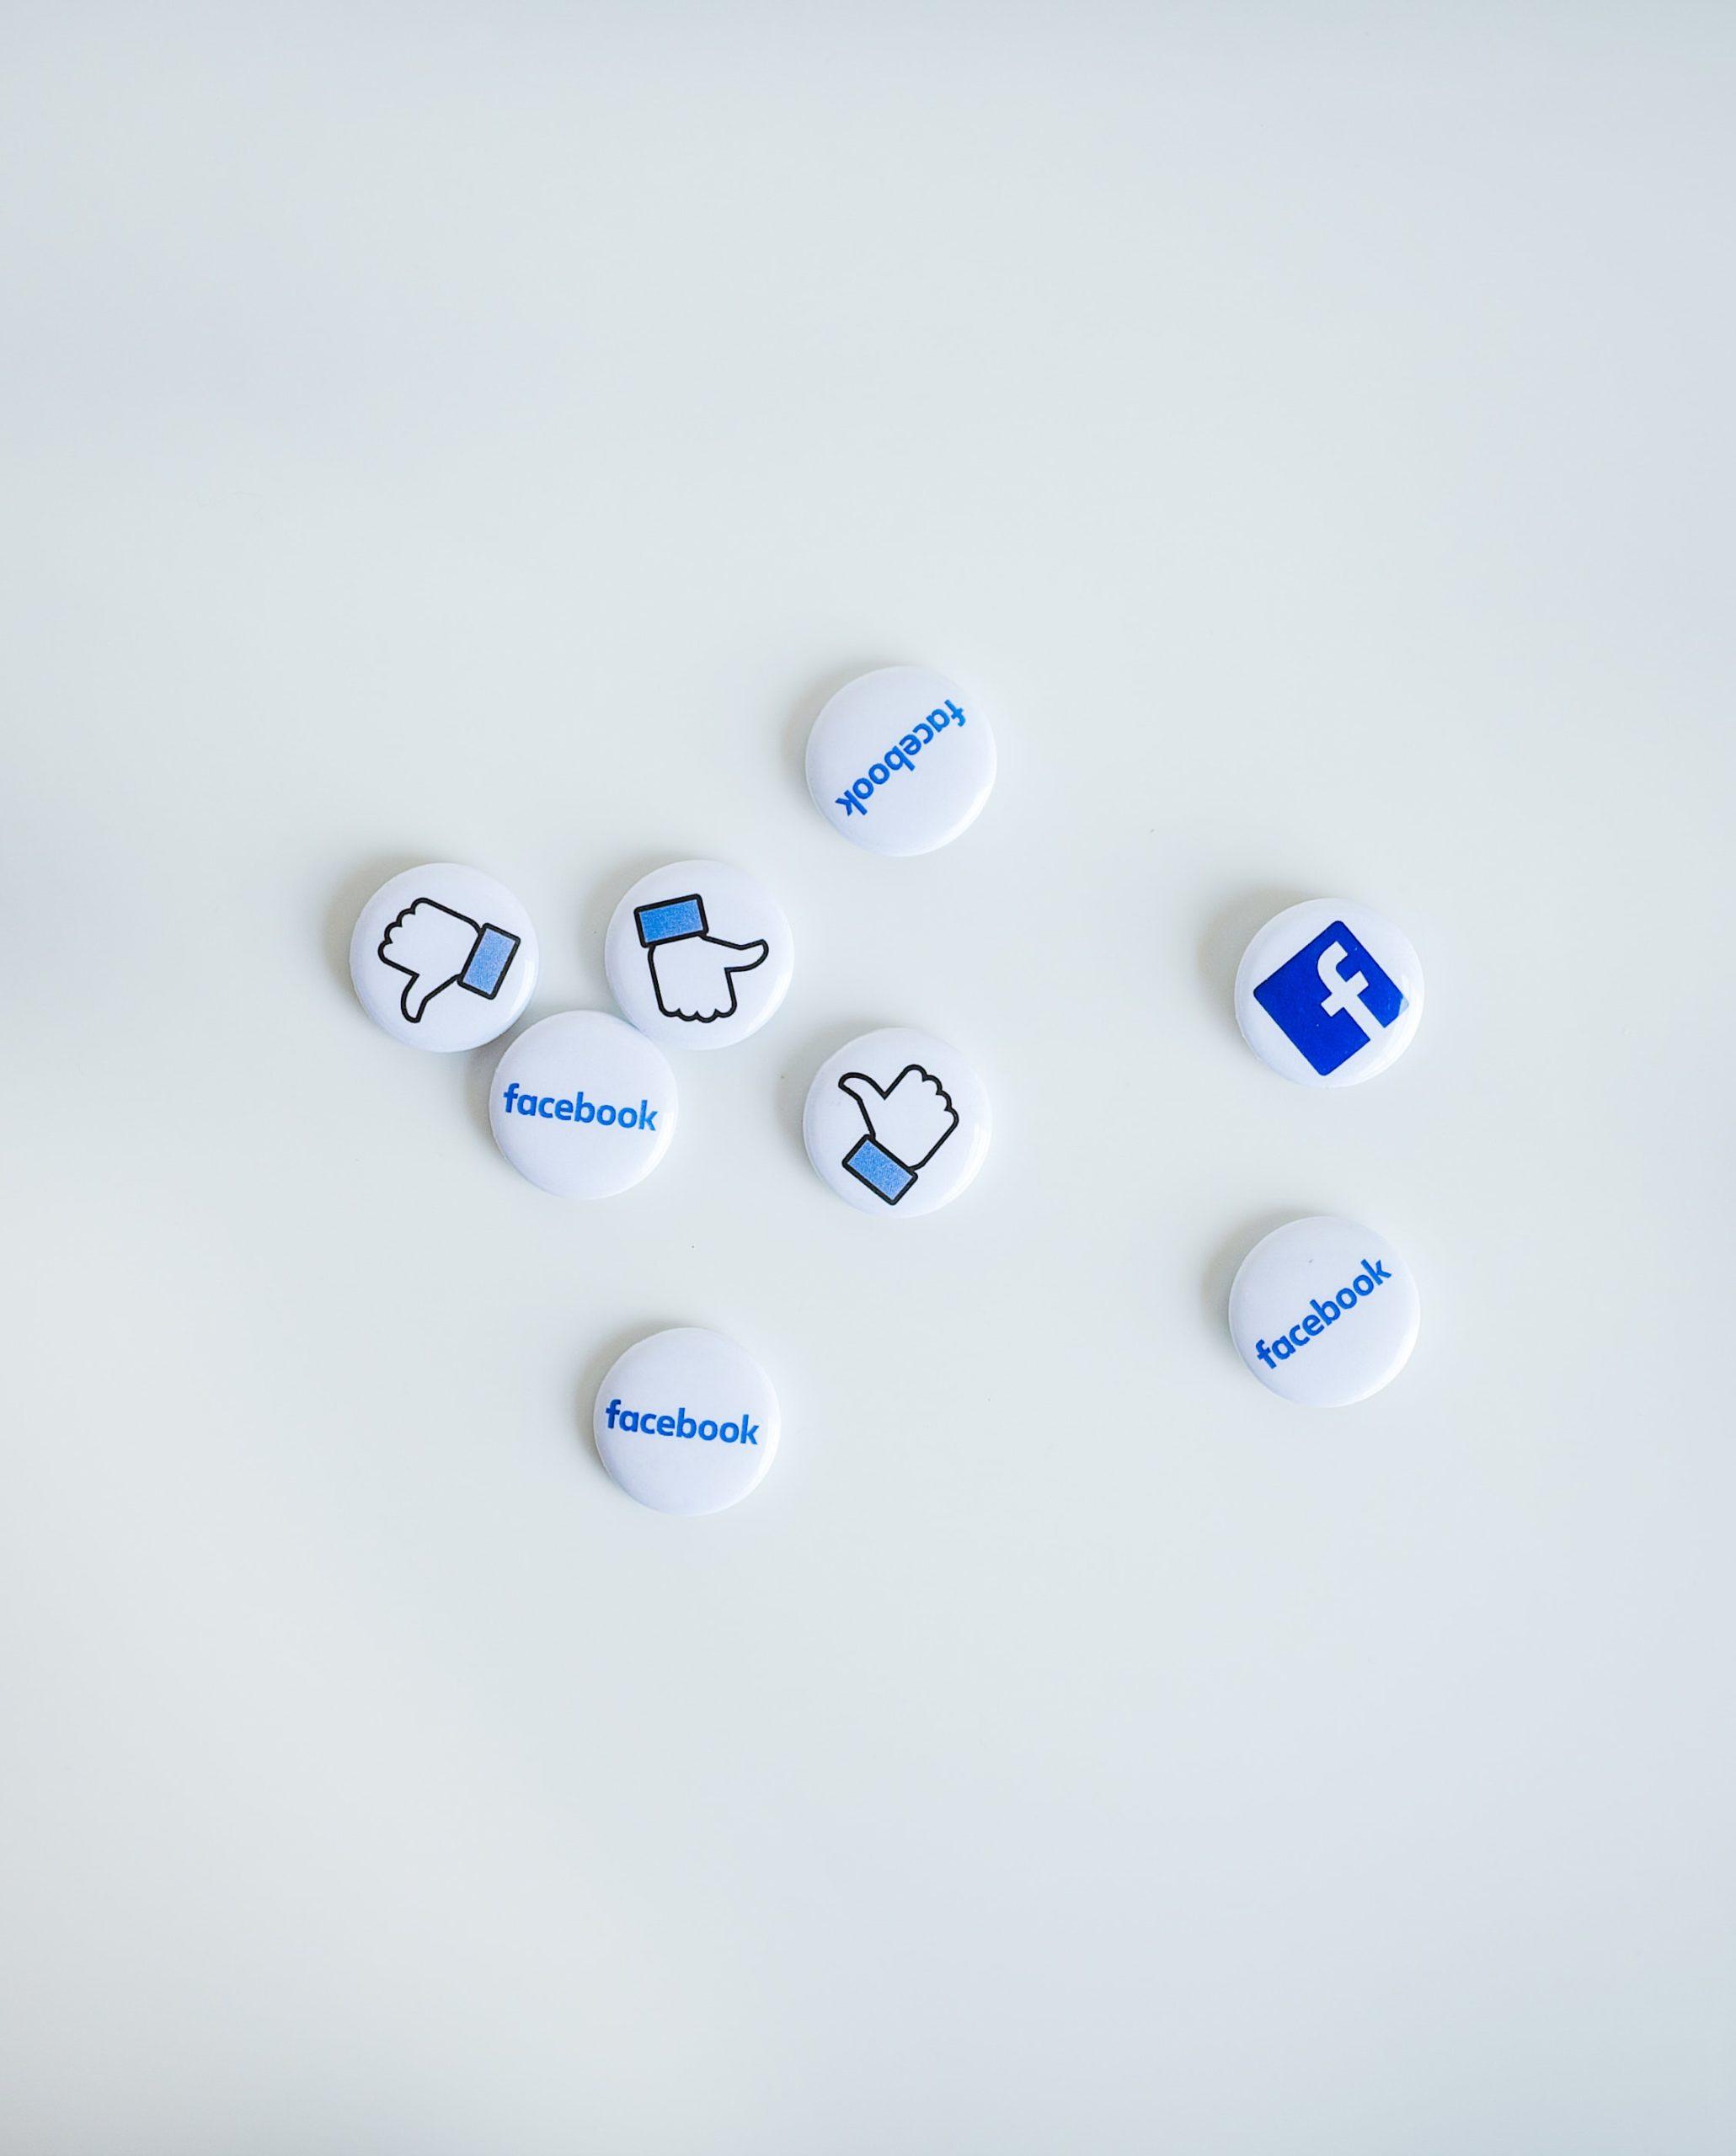 Facebook-like-tracking